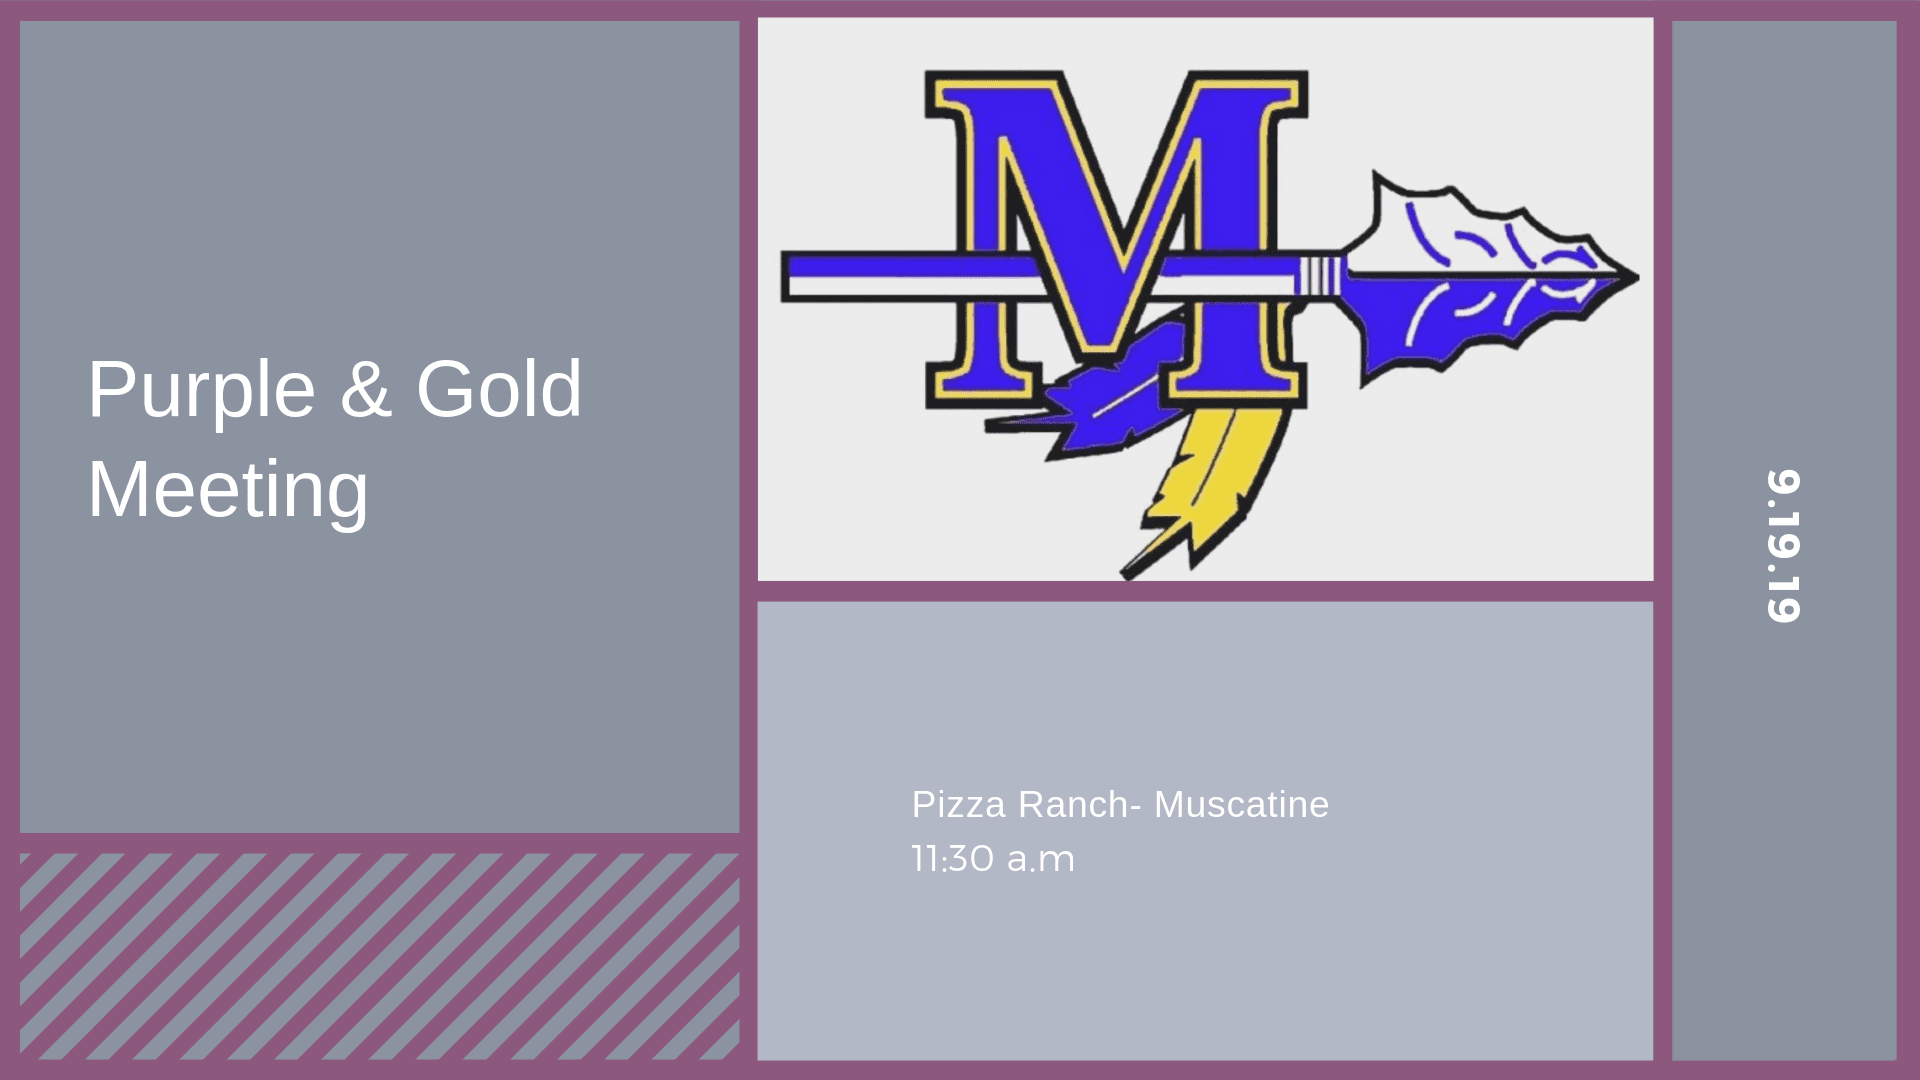 Purple & Gold Meeting